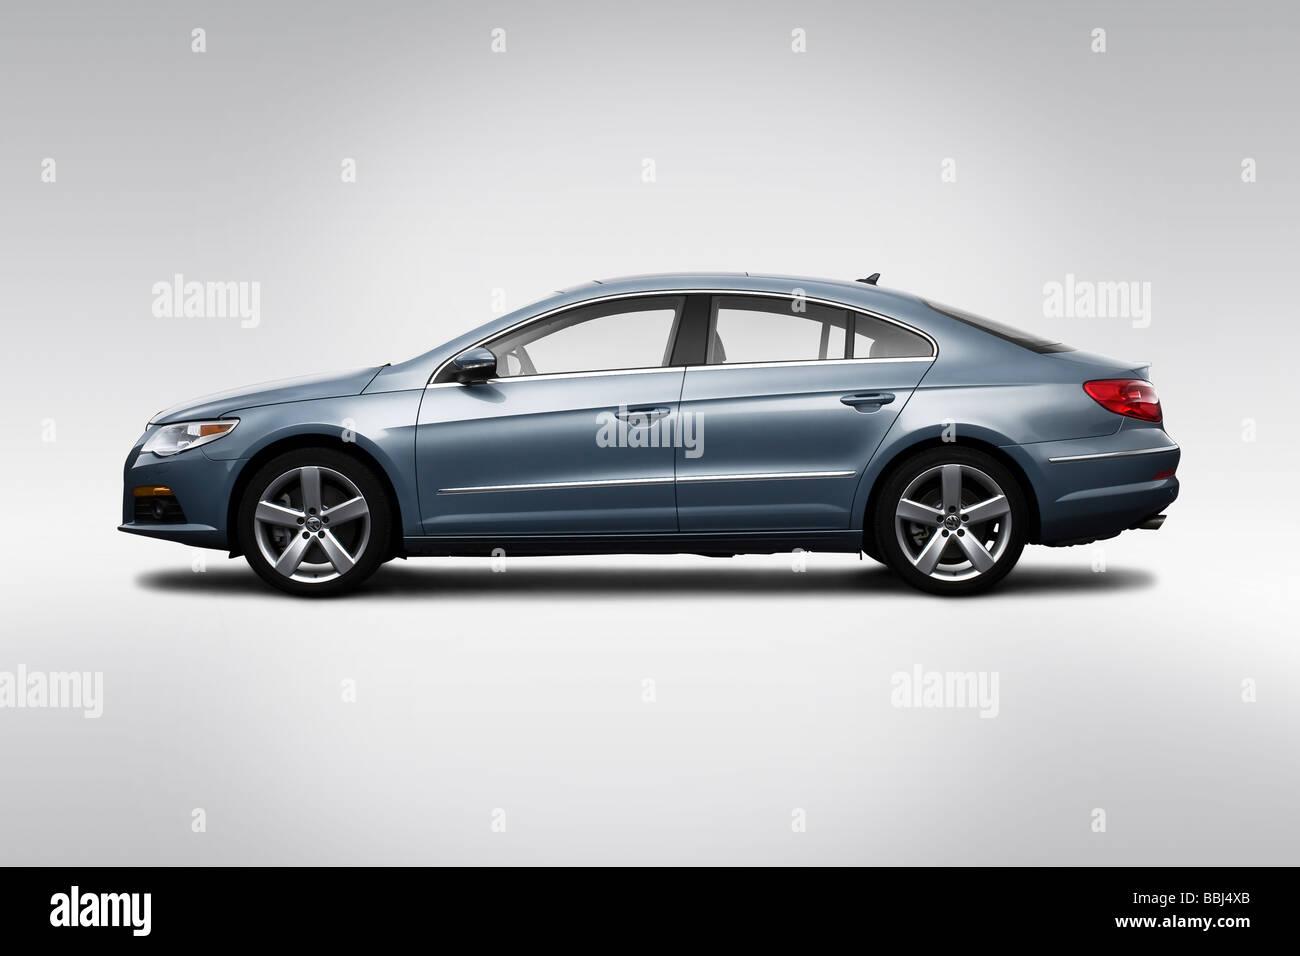 2009 Volkswagen CC VR6 in Gray - Drivers Side Profile Stock Photo